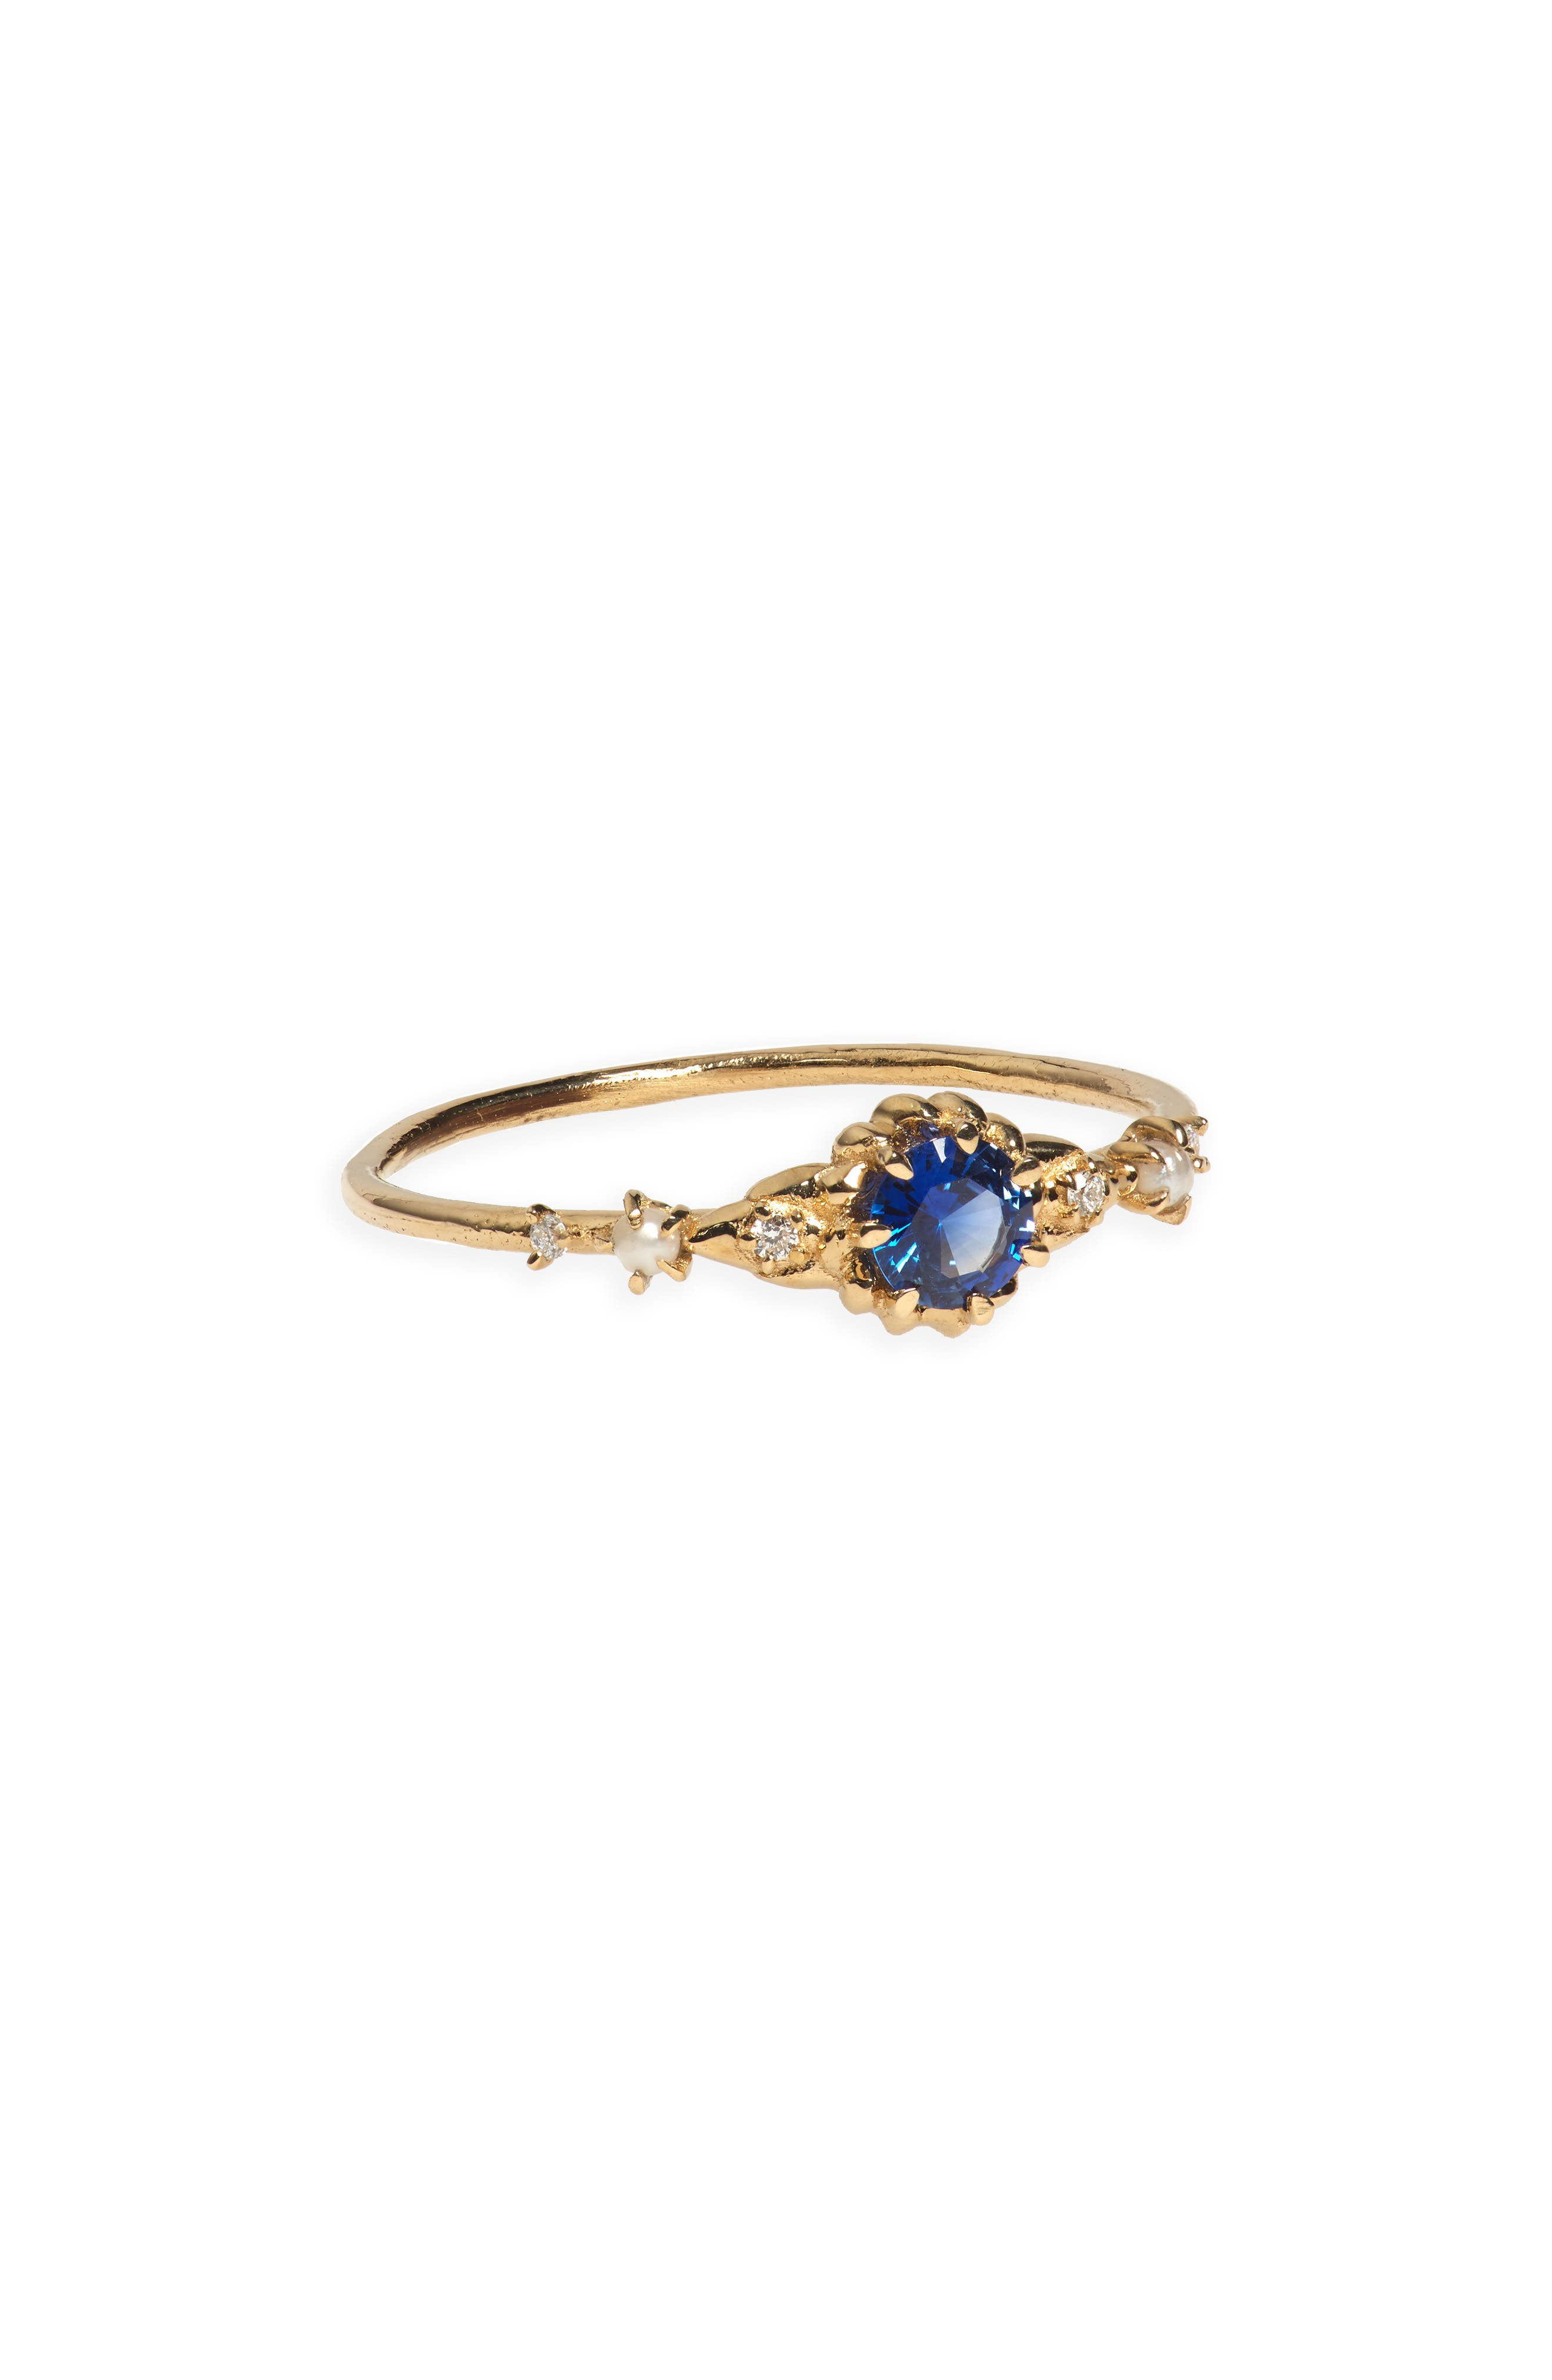 Sofia Zakia Clara's Dream Sapphire, Diamond & Freshwater Pearl Ring